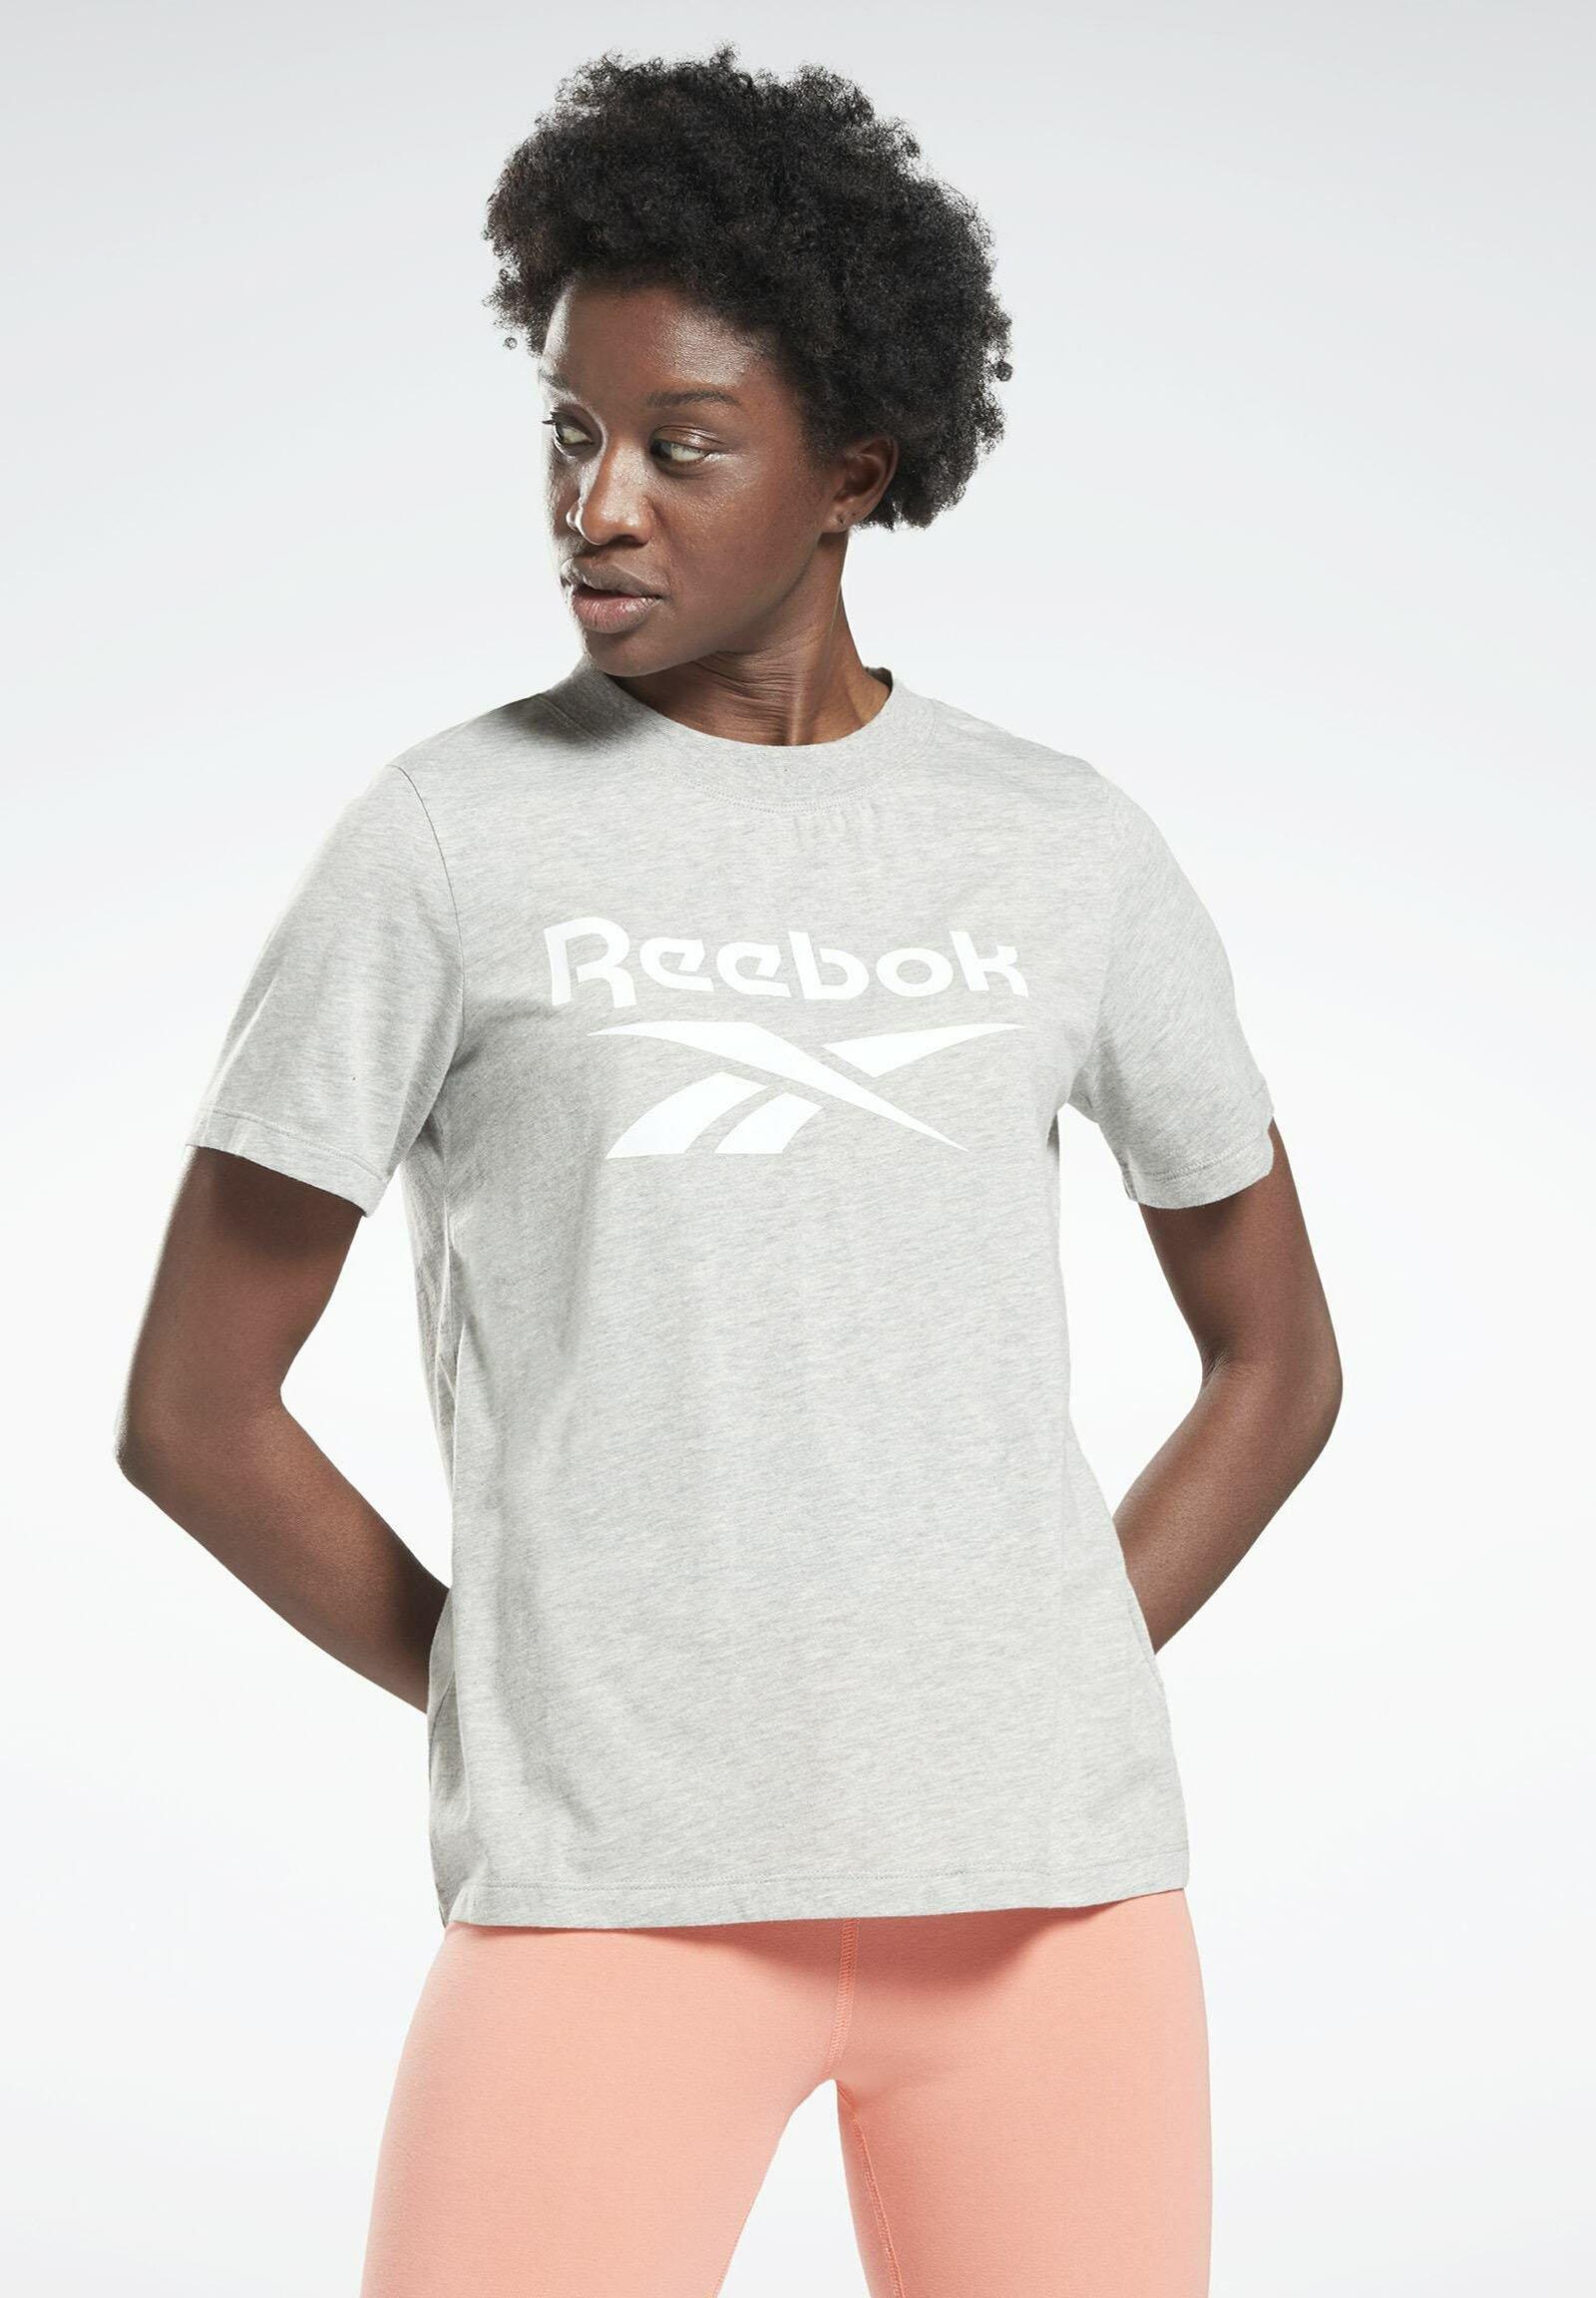 Women REEBOK IDENTITY REECYCLED GRAPHIC - Print T-shirt